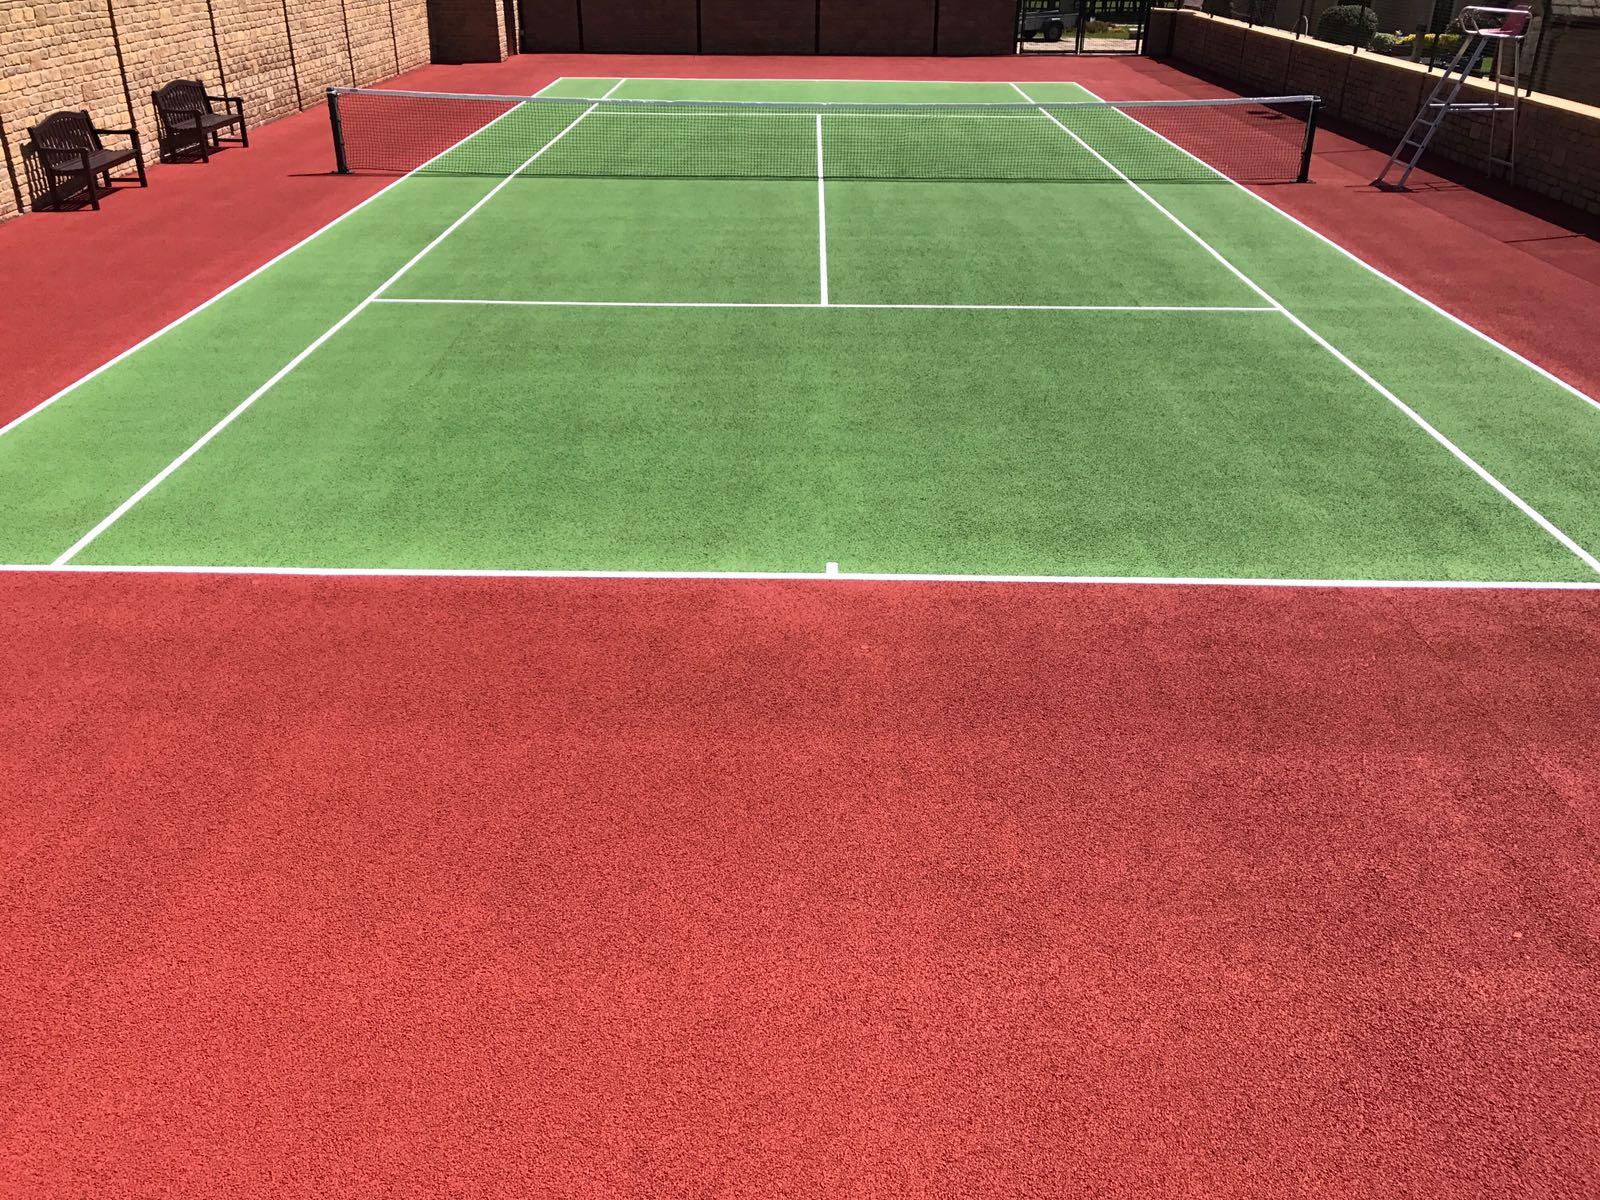 tennis court Mccourt construction inc is a tennis court construction and repair company in miami.